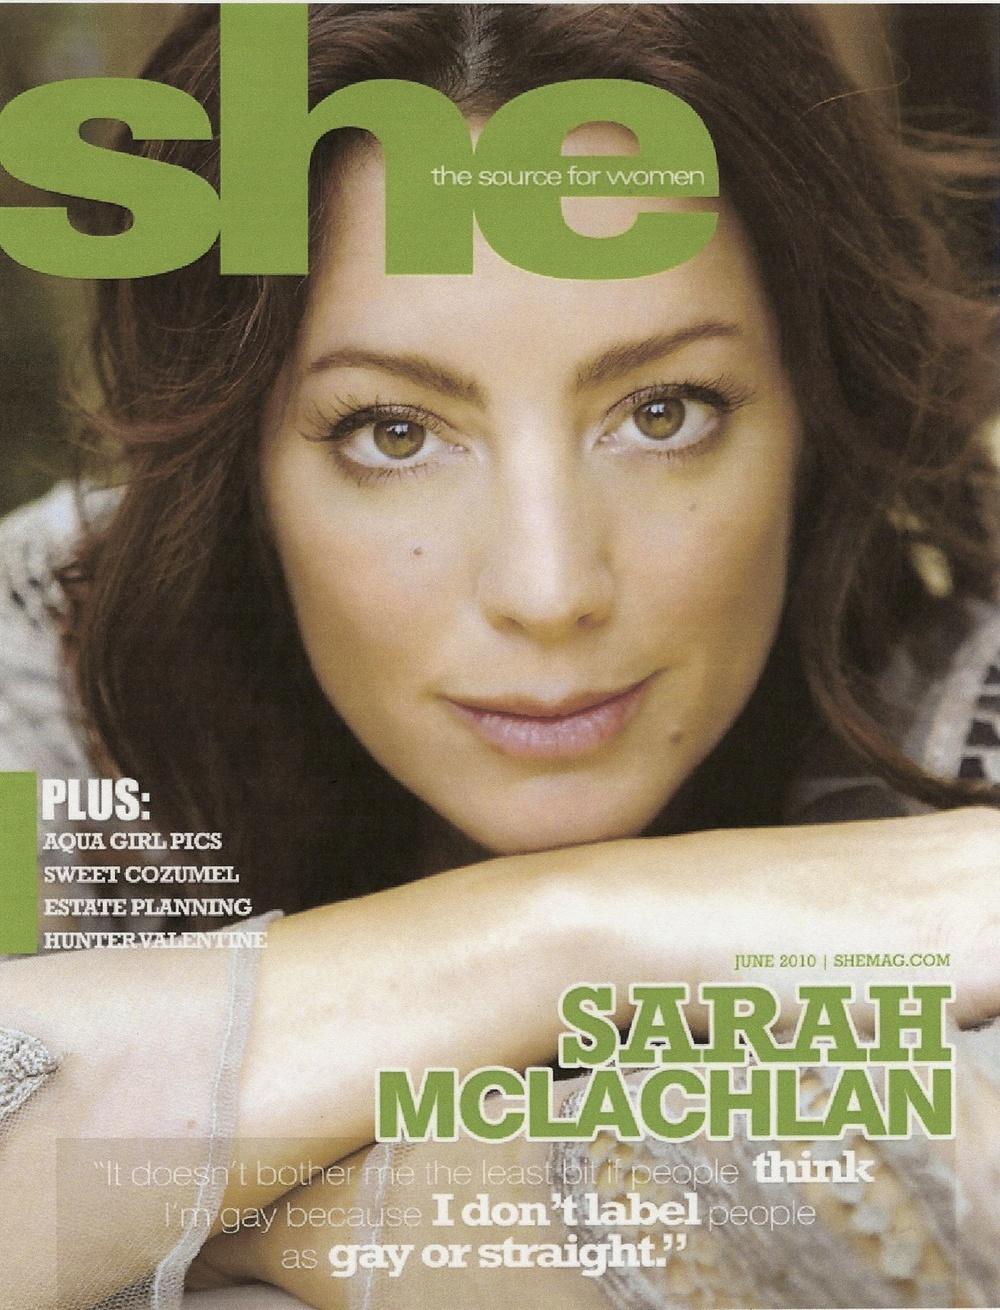 SarahMcLachlan1.jpg